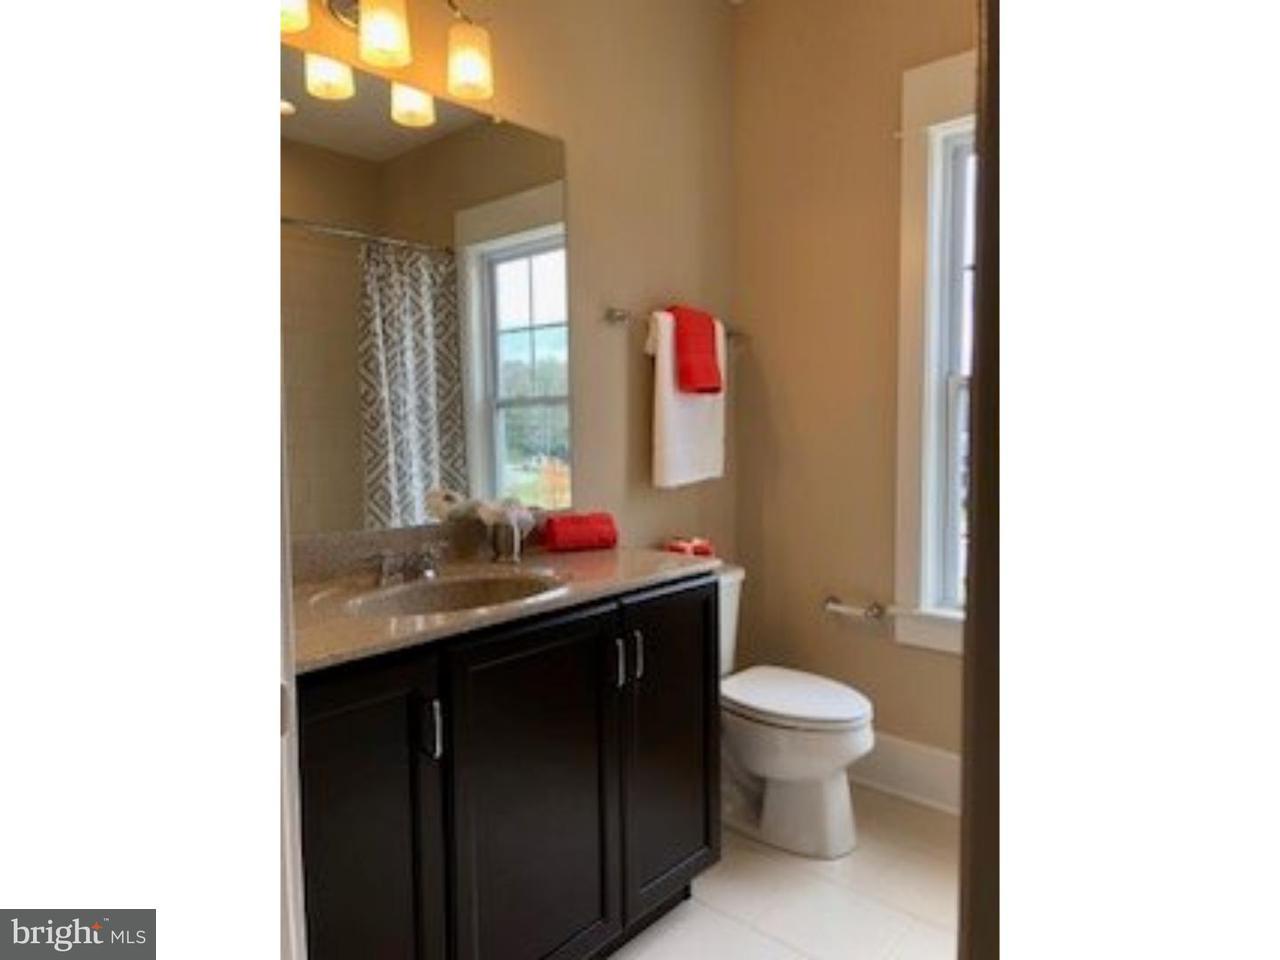 Additional photo for property listing at 133 SPRING OAK DR #000ASH  Malvern, Pennsylvanie 19355 États-Unis